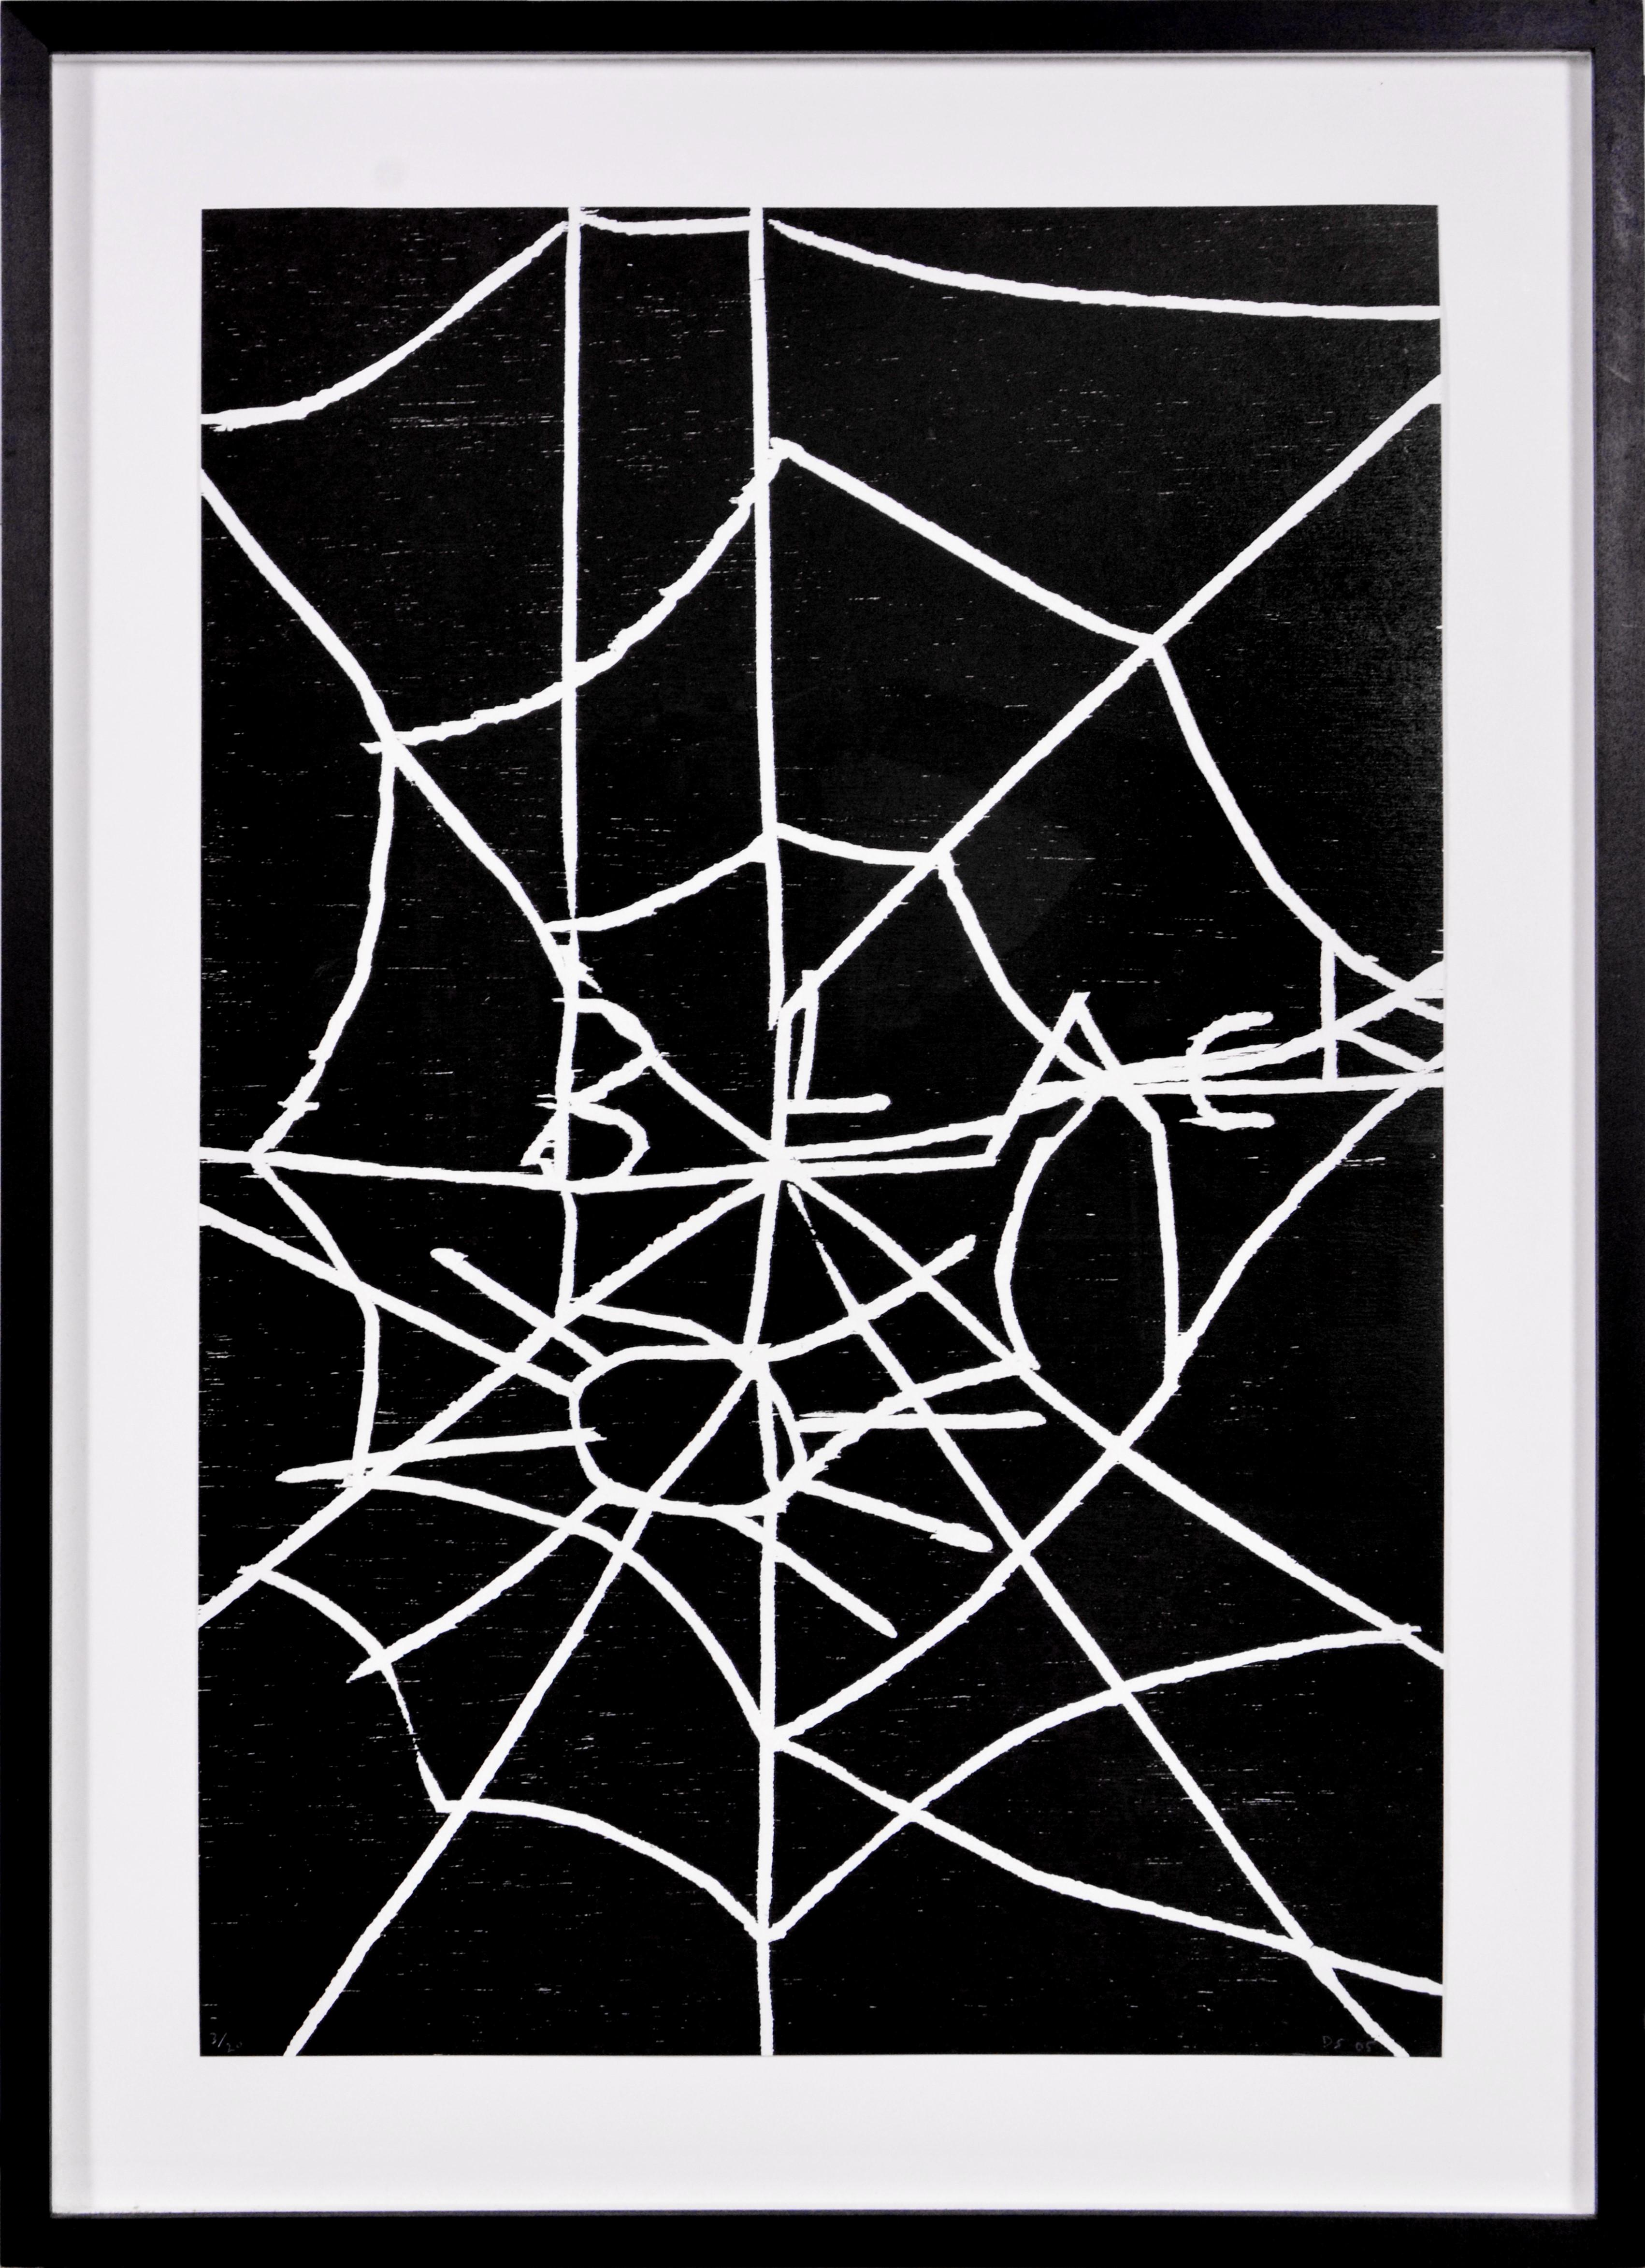 David Shrigley, Web, Woodcut, 2005